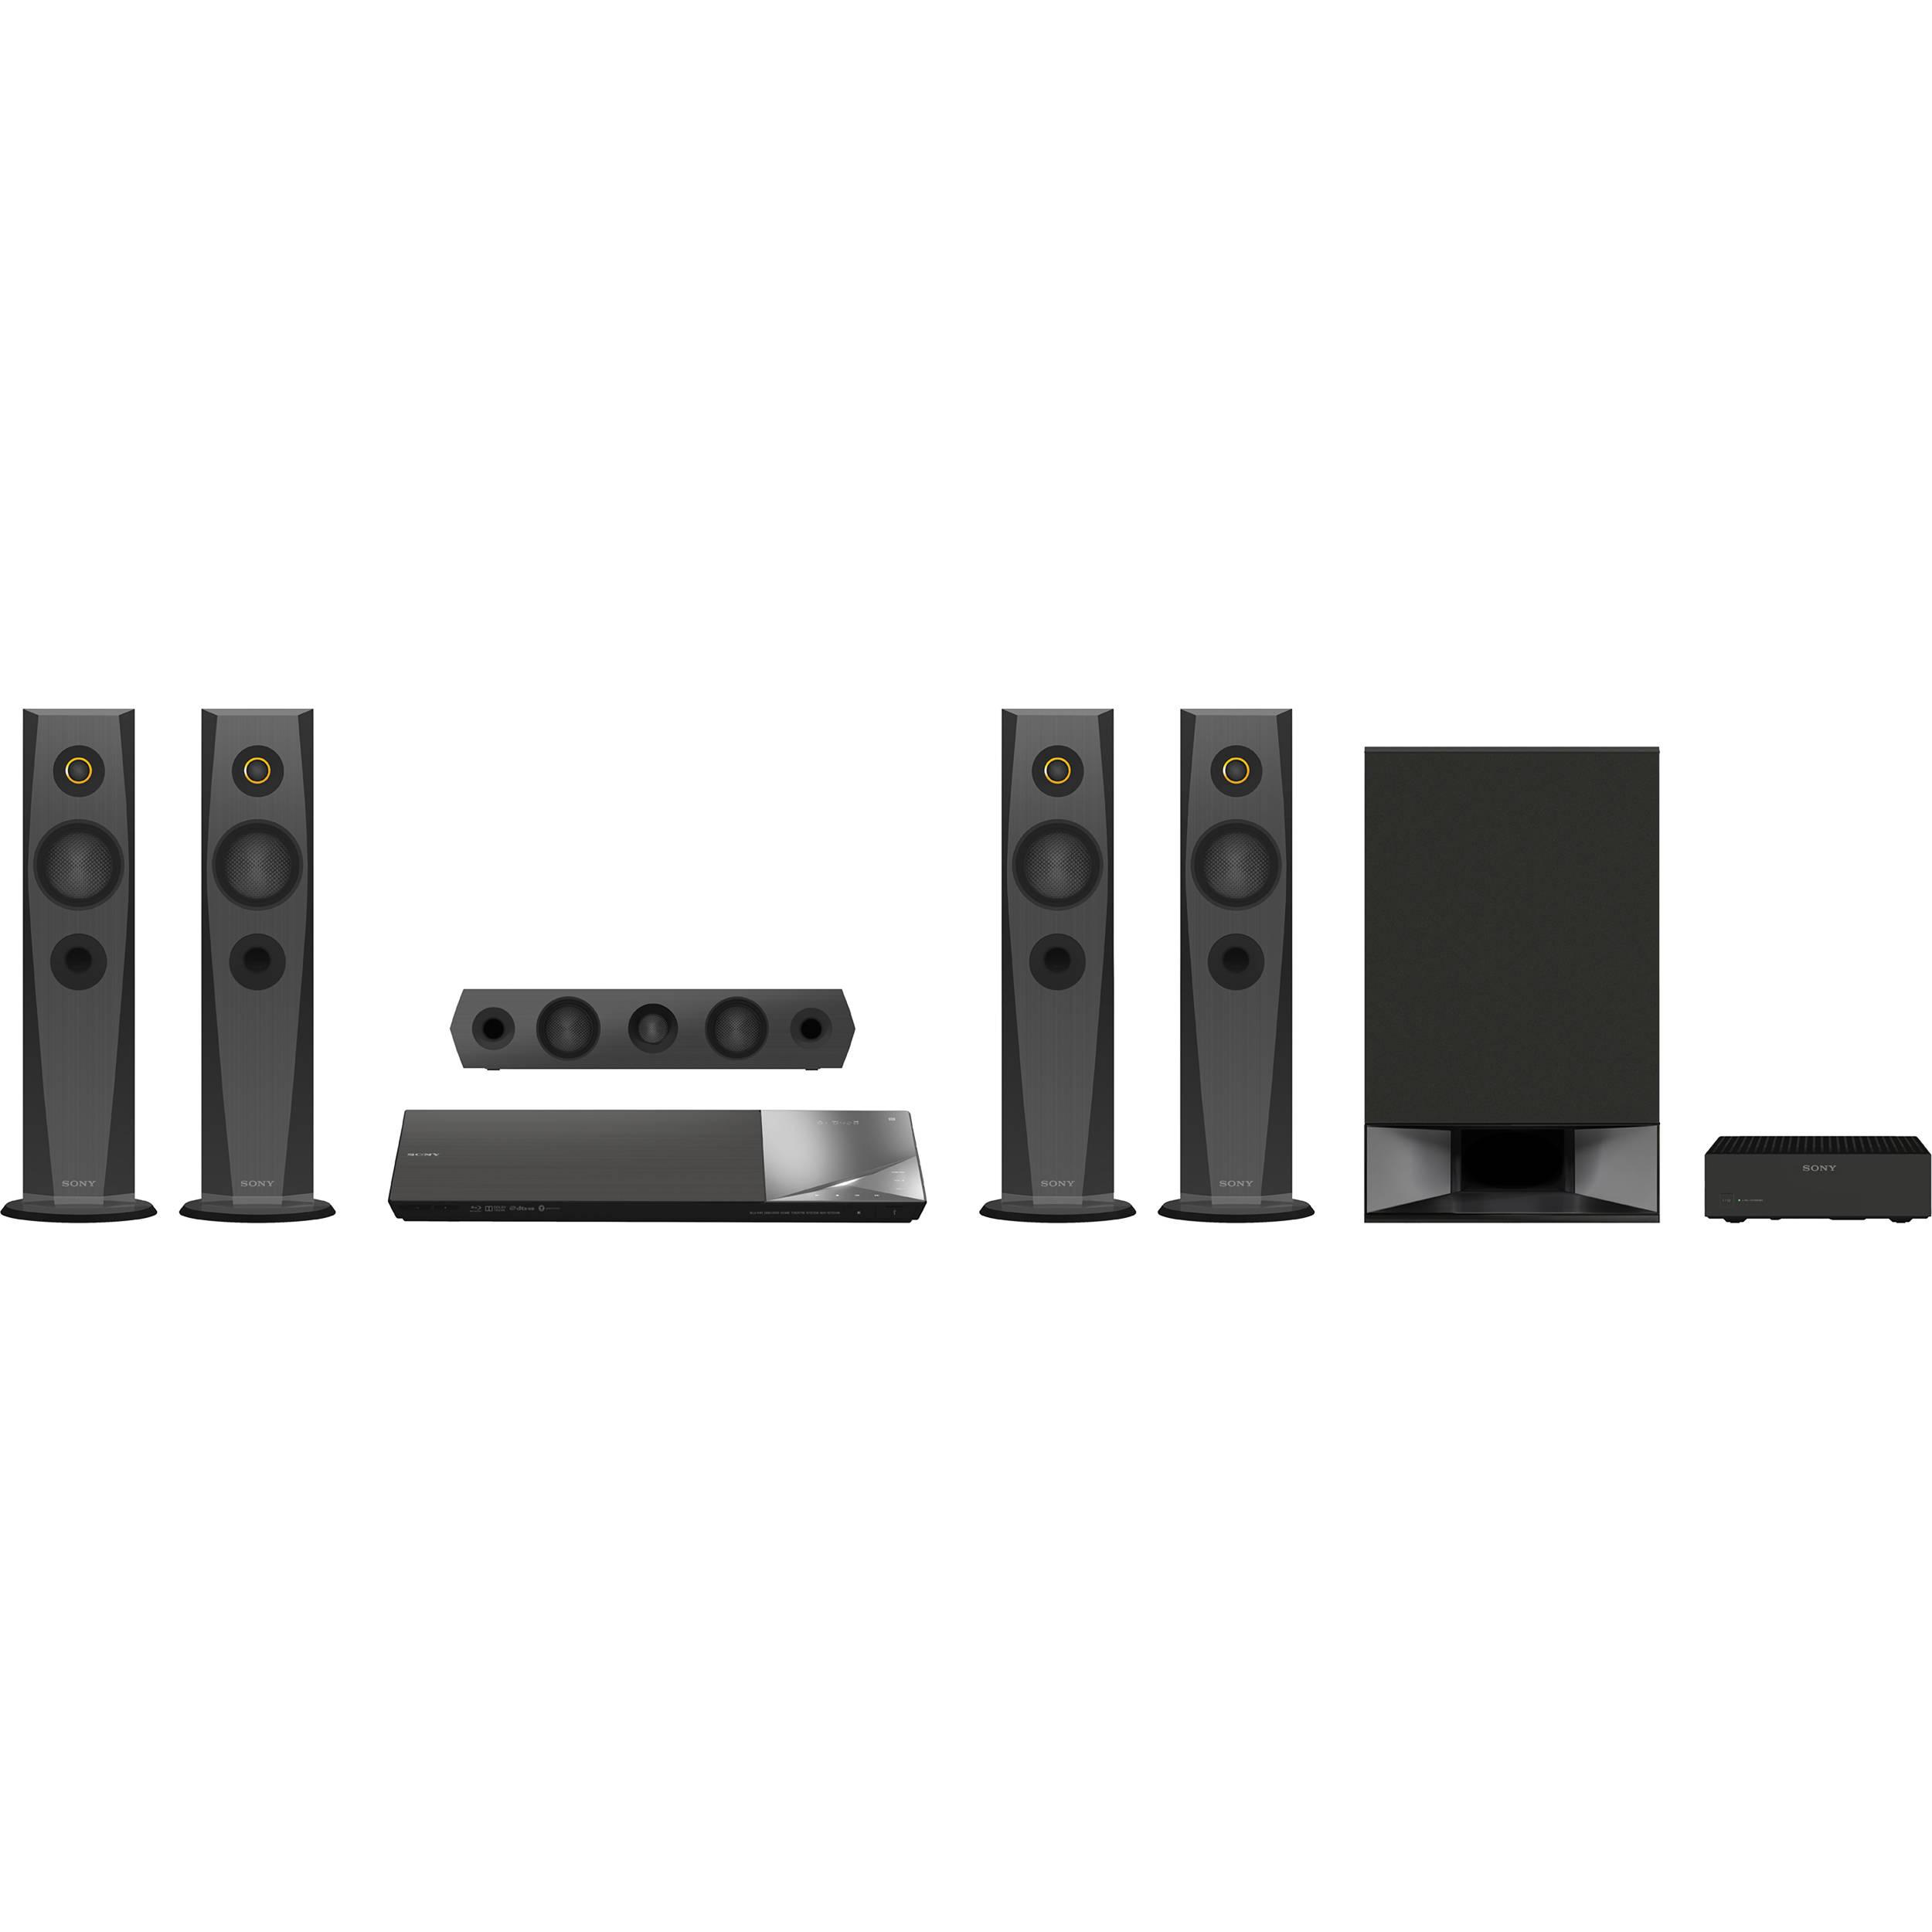 sony bdv n7200w 5 1 channel 1200w 3d smart blu ray bdvn7200w b h. Black Bedroom Furniture Sets. Home Design Ideas